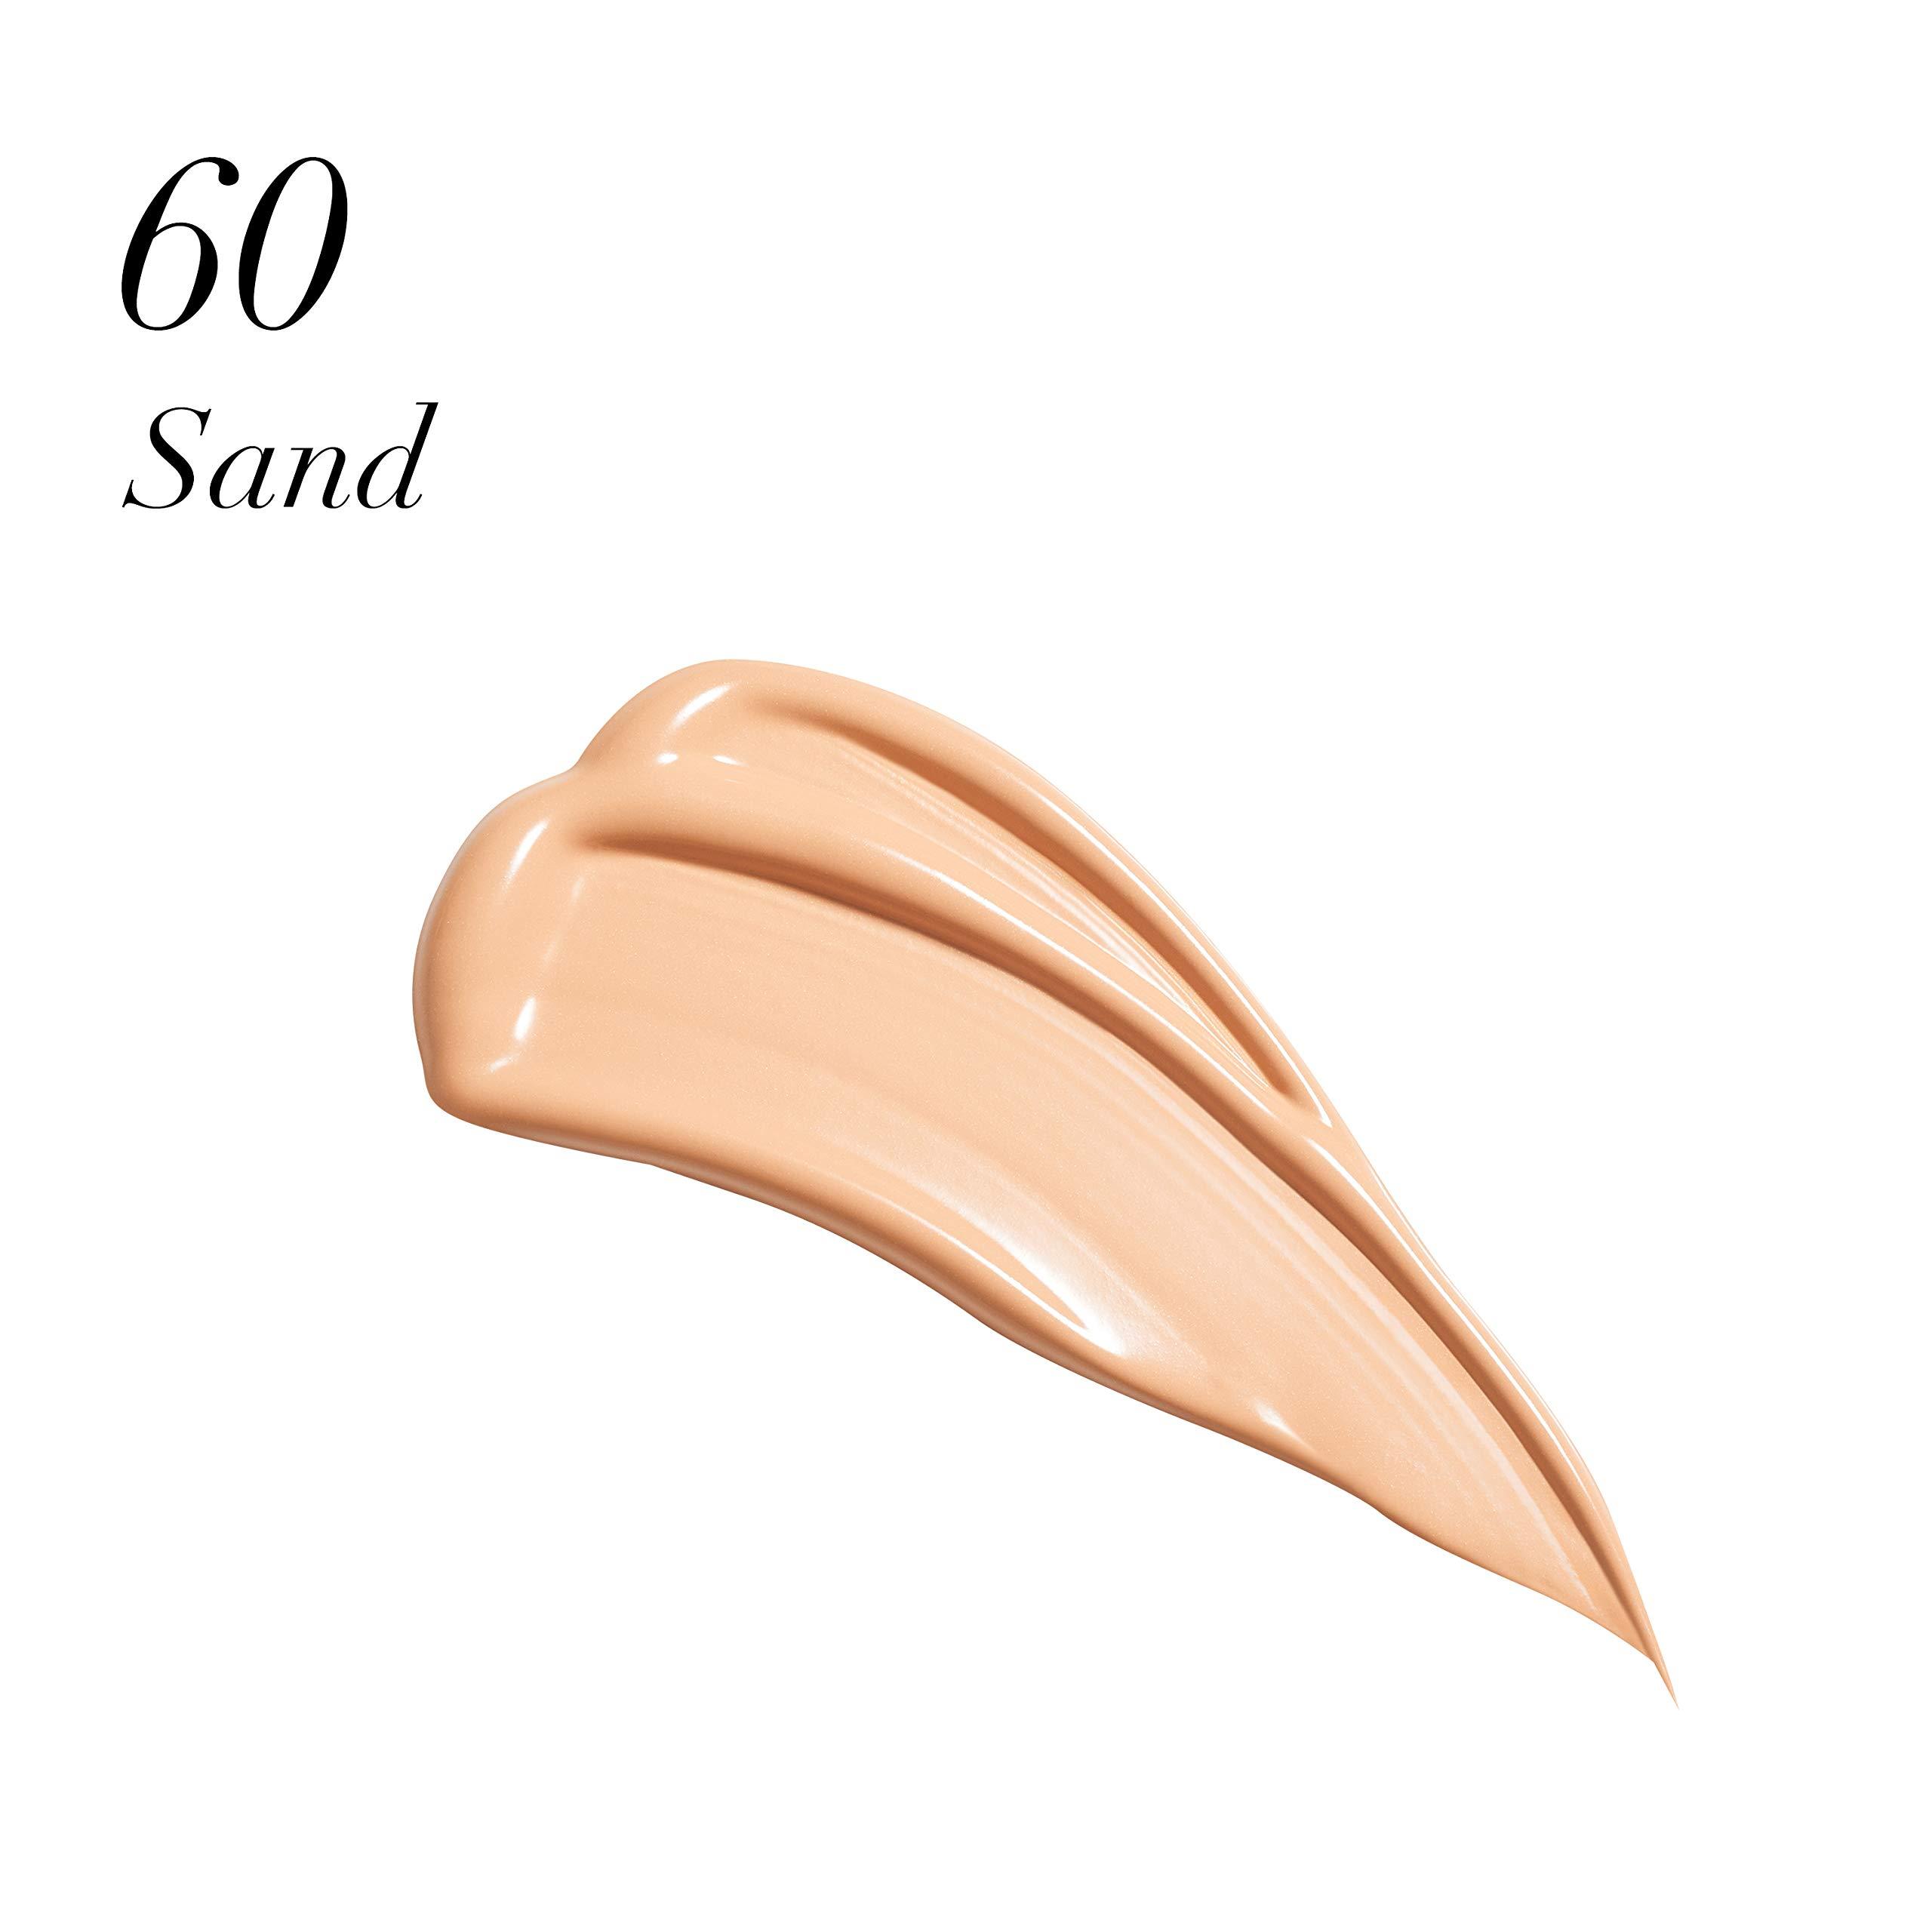 Max Factor Radiant Lift Base de maquillaje Tono 60 Sand (Pieles claras) -30ml.